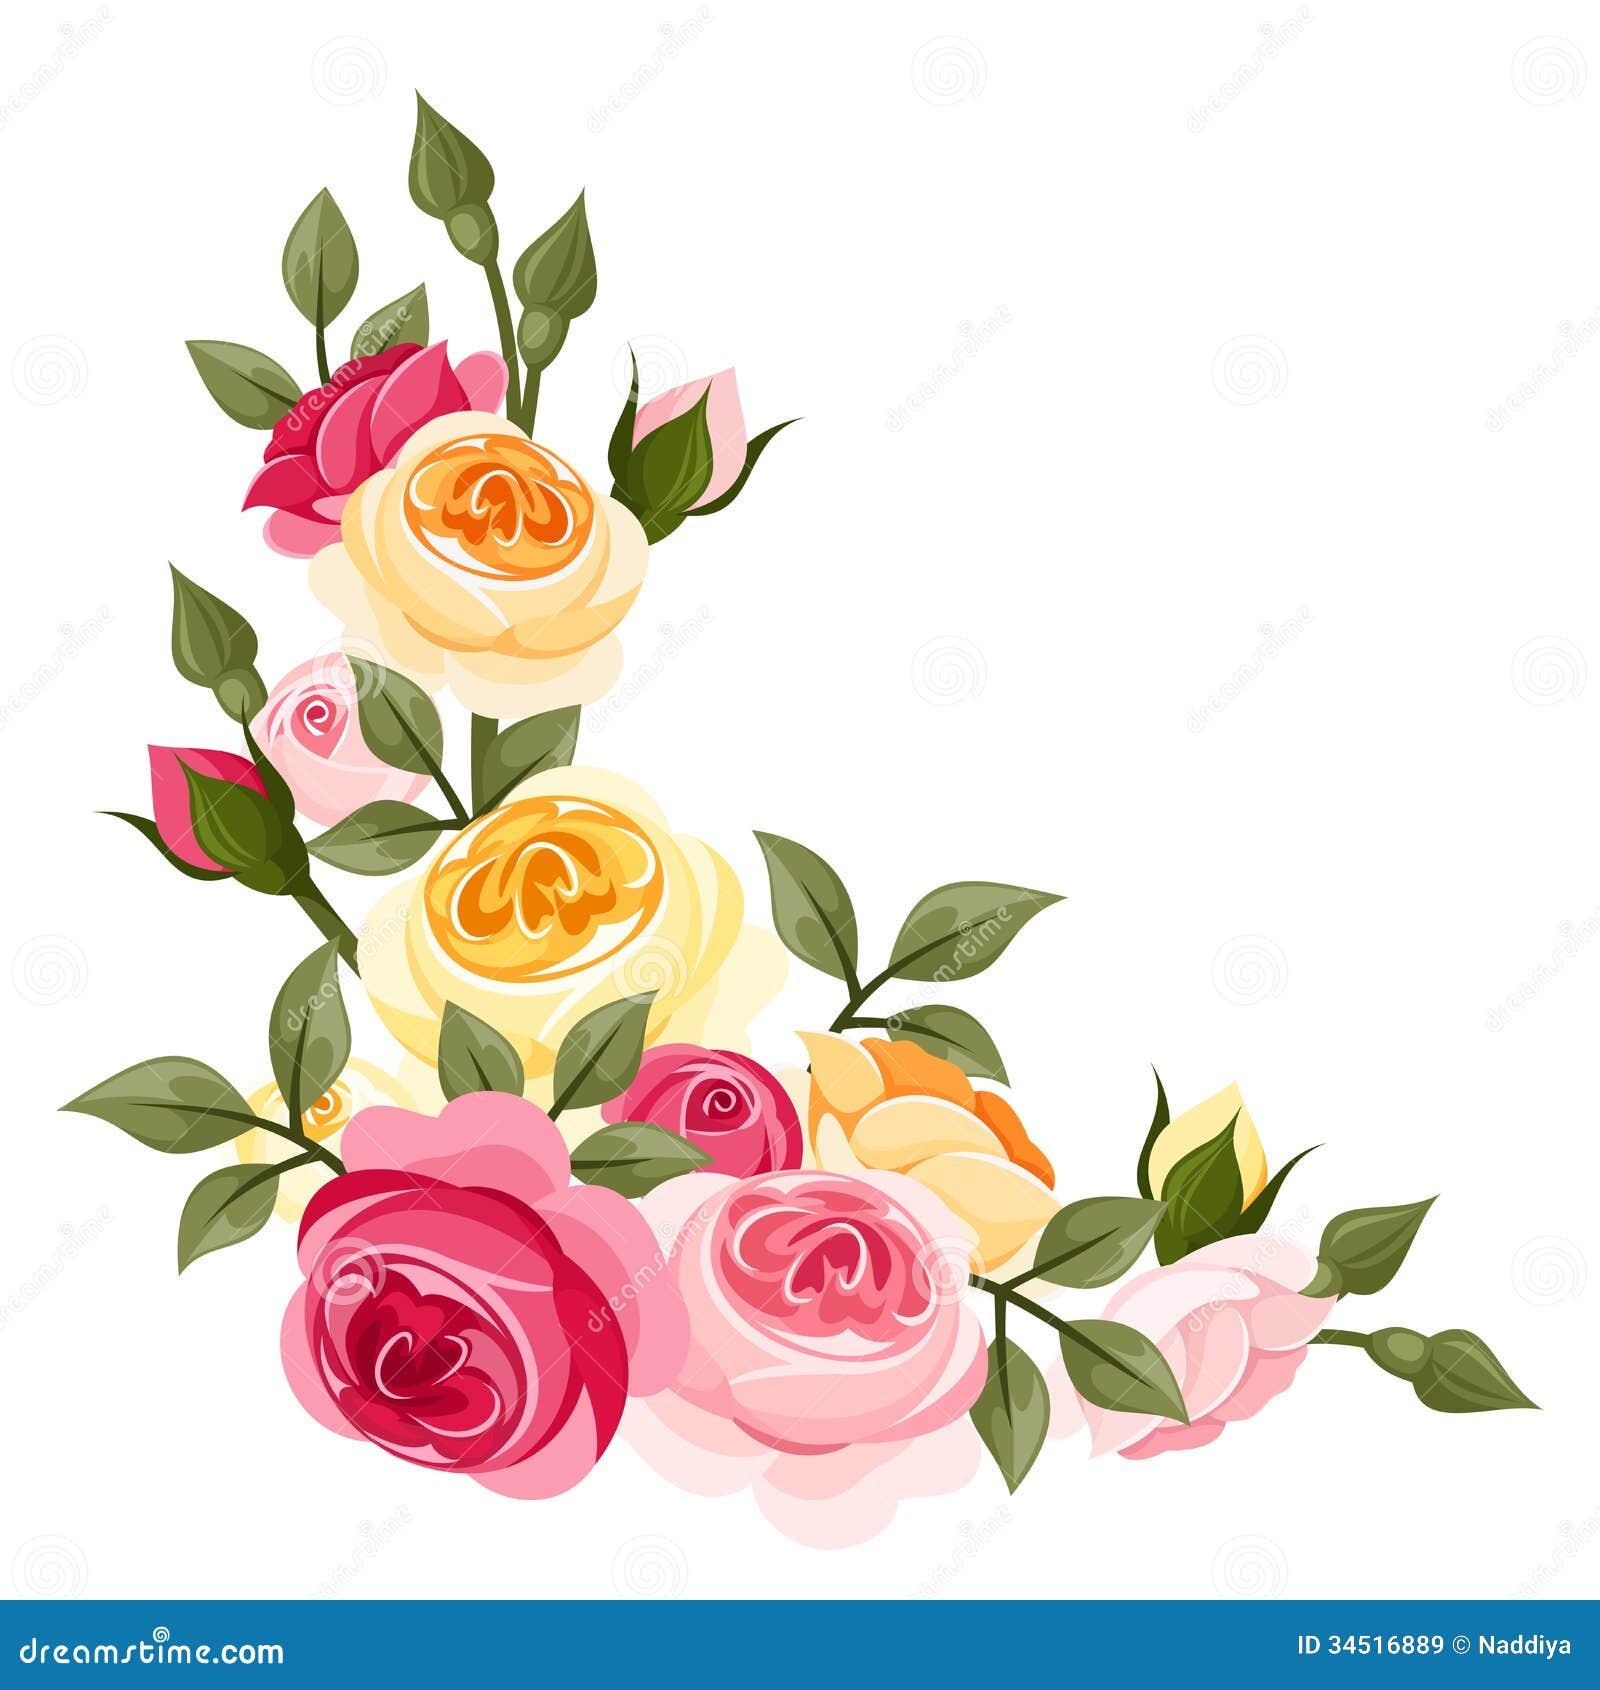 clipart english rose - photo #7